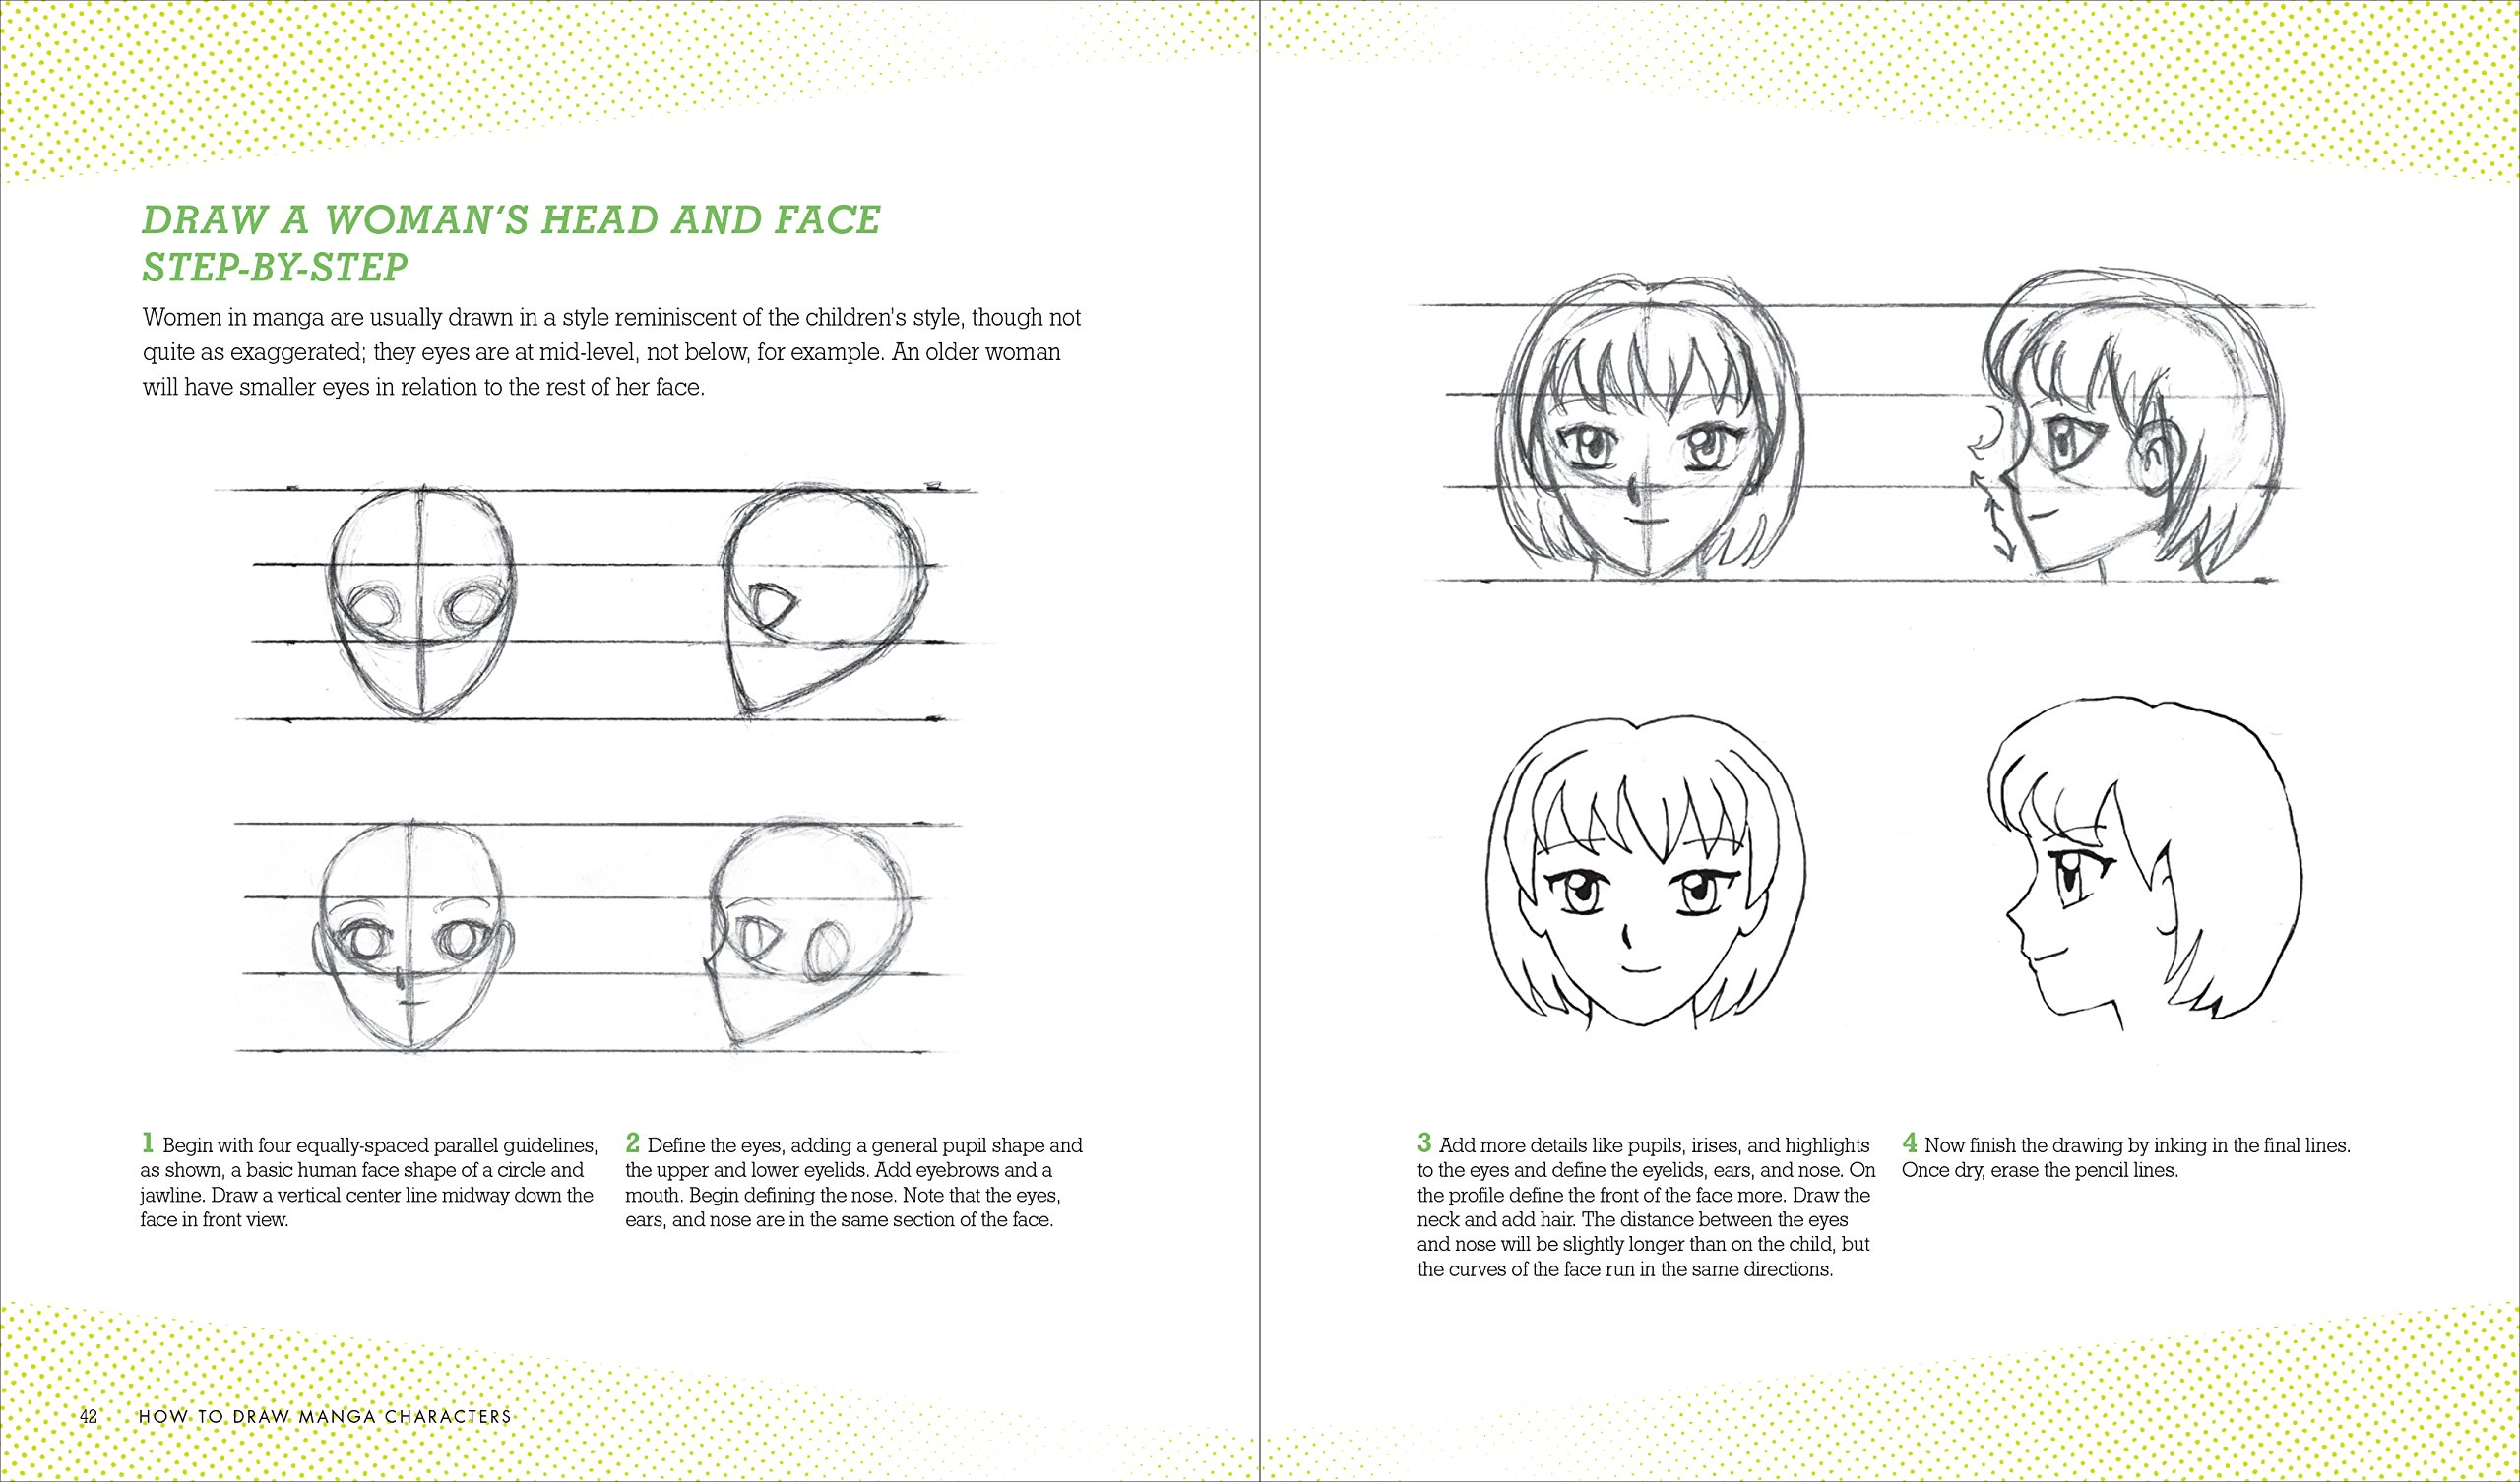 How to draw manga characters a beginners guide j c amberlyn 9781580934534 amazon com books